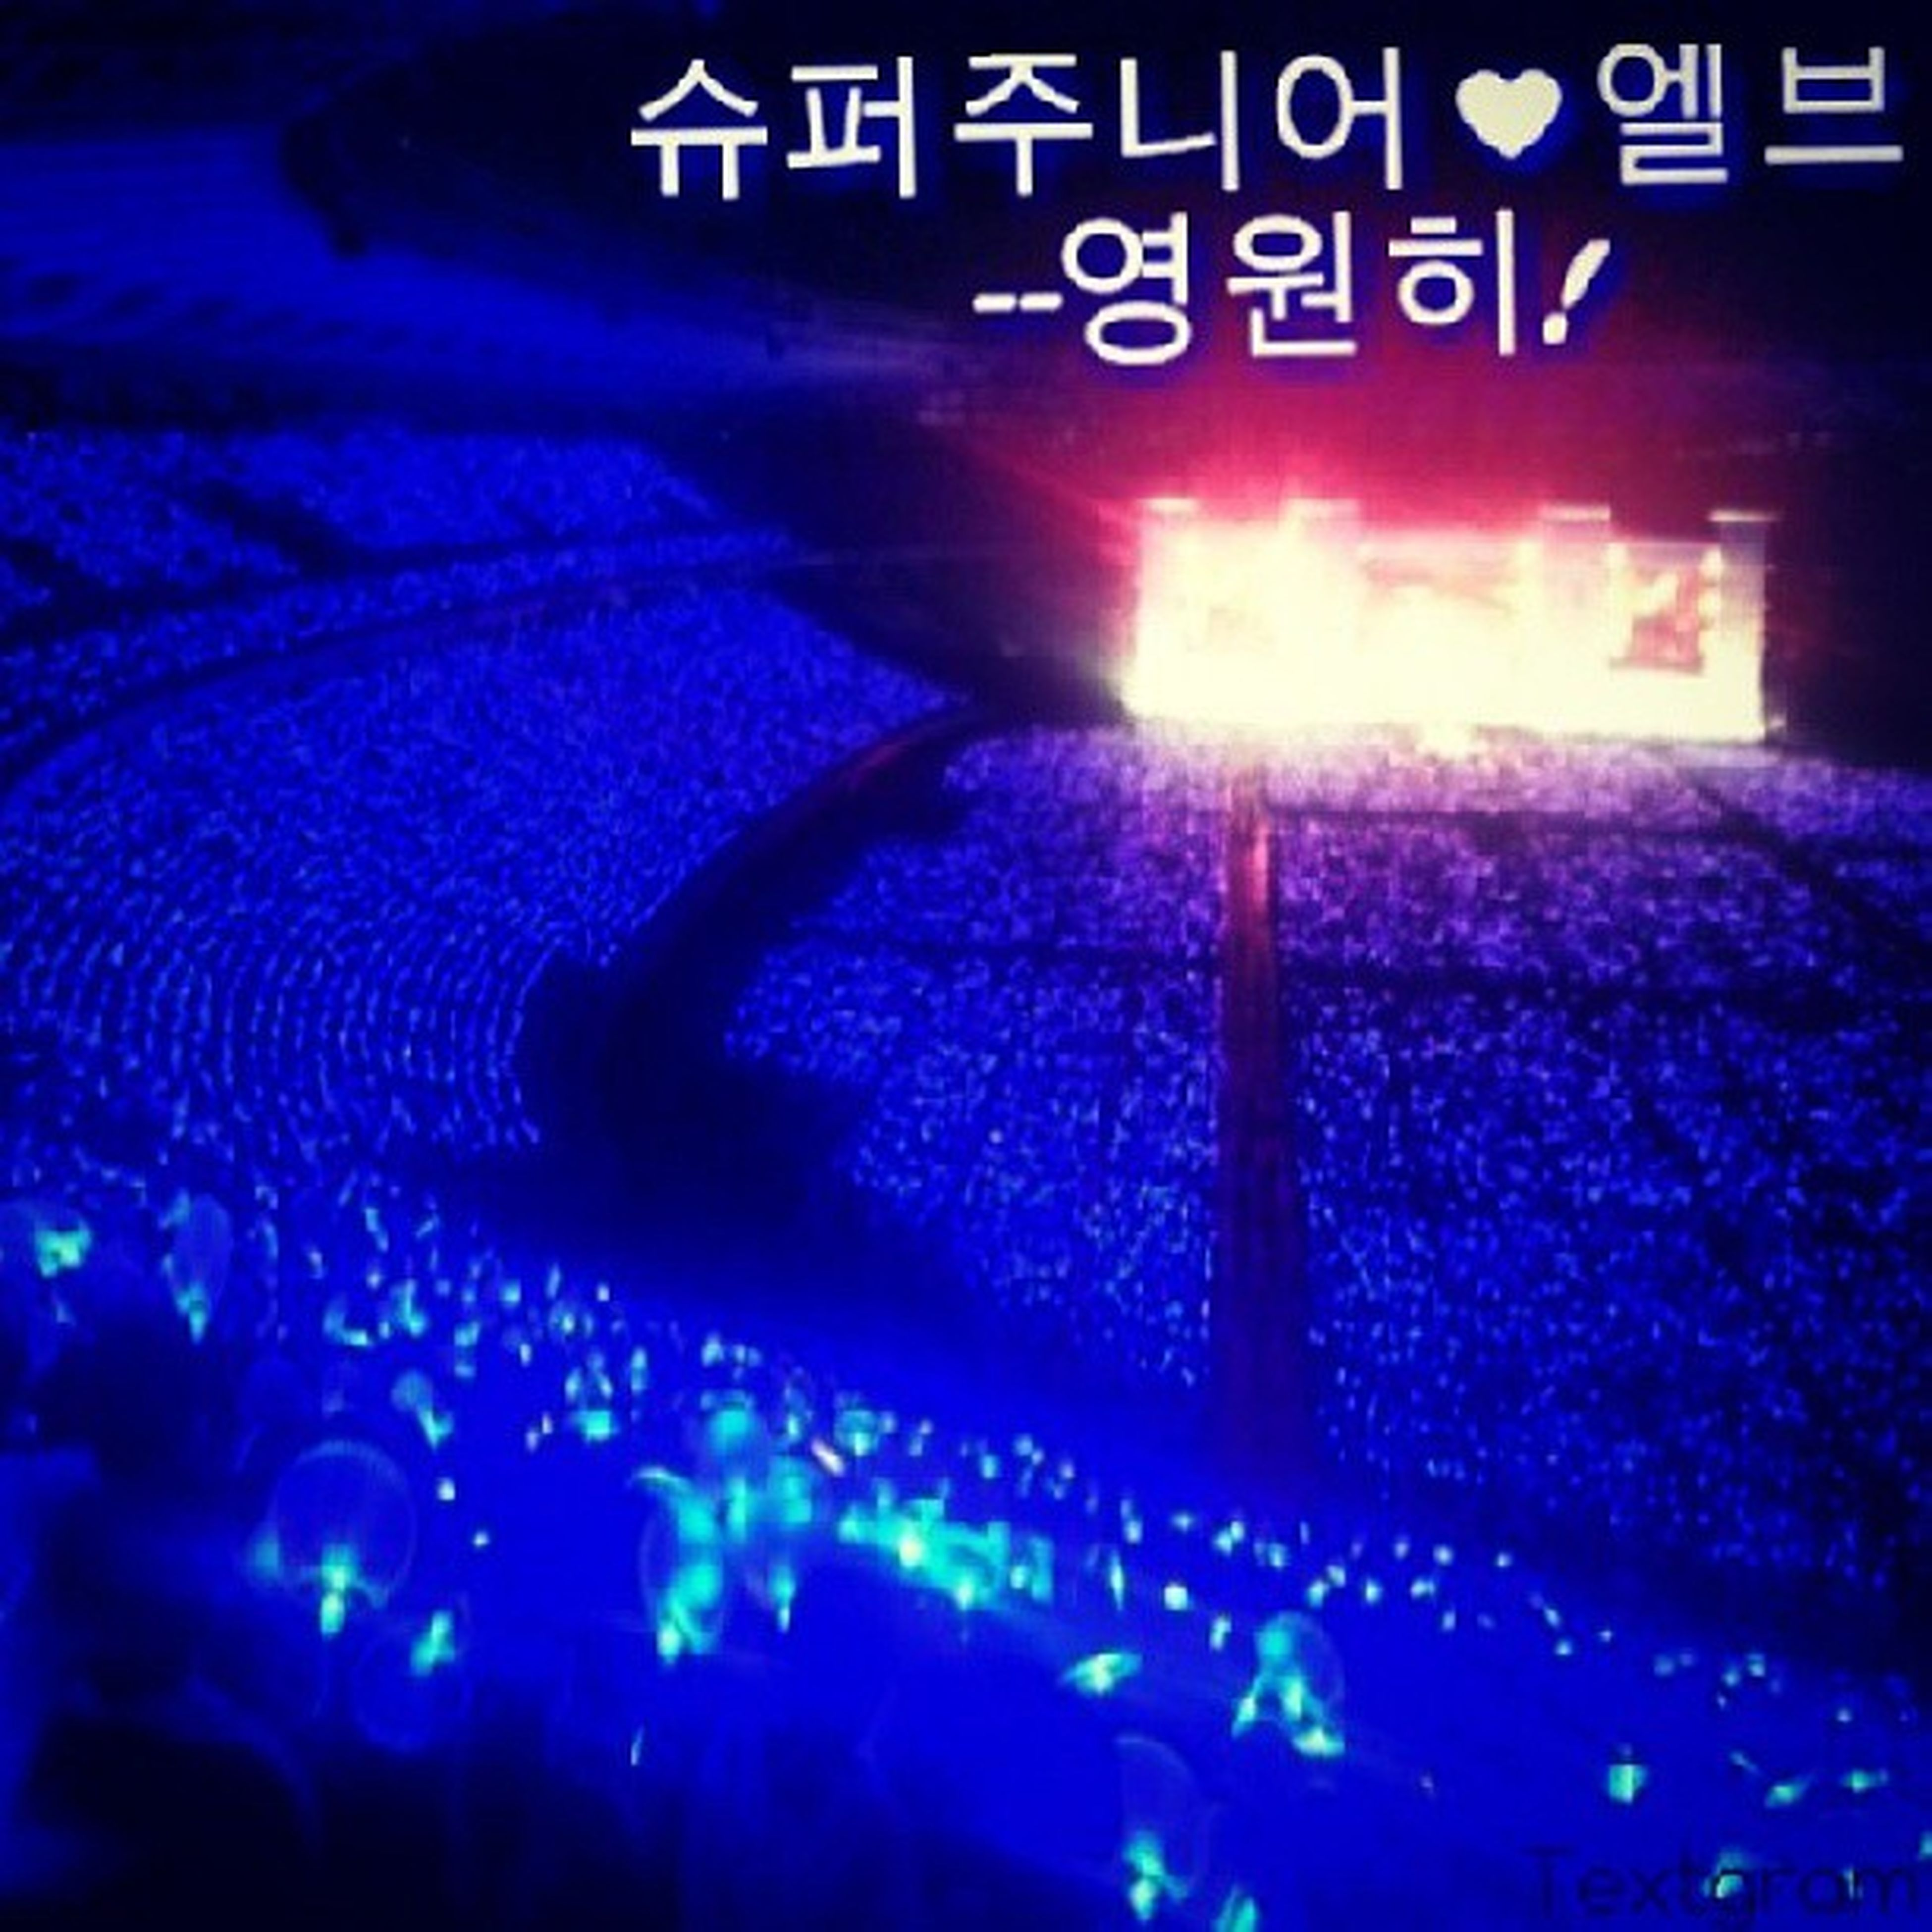 THE SAPPHIRE BLUE OCEAN. ♥ Trend this, guise! SuperJuniorArtistSaga Go lang ng go, kahit mapudpod pa man 'tong mga daliri natin. LOL. :)))) Suju Elf Superjunior kpop love